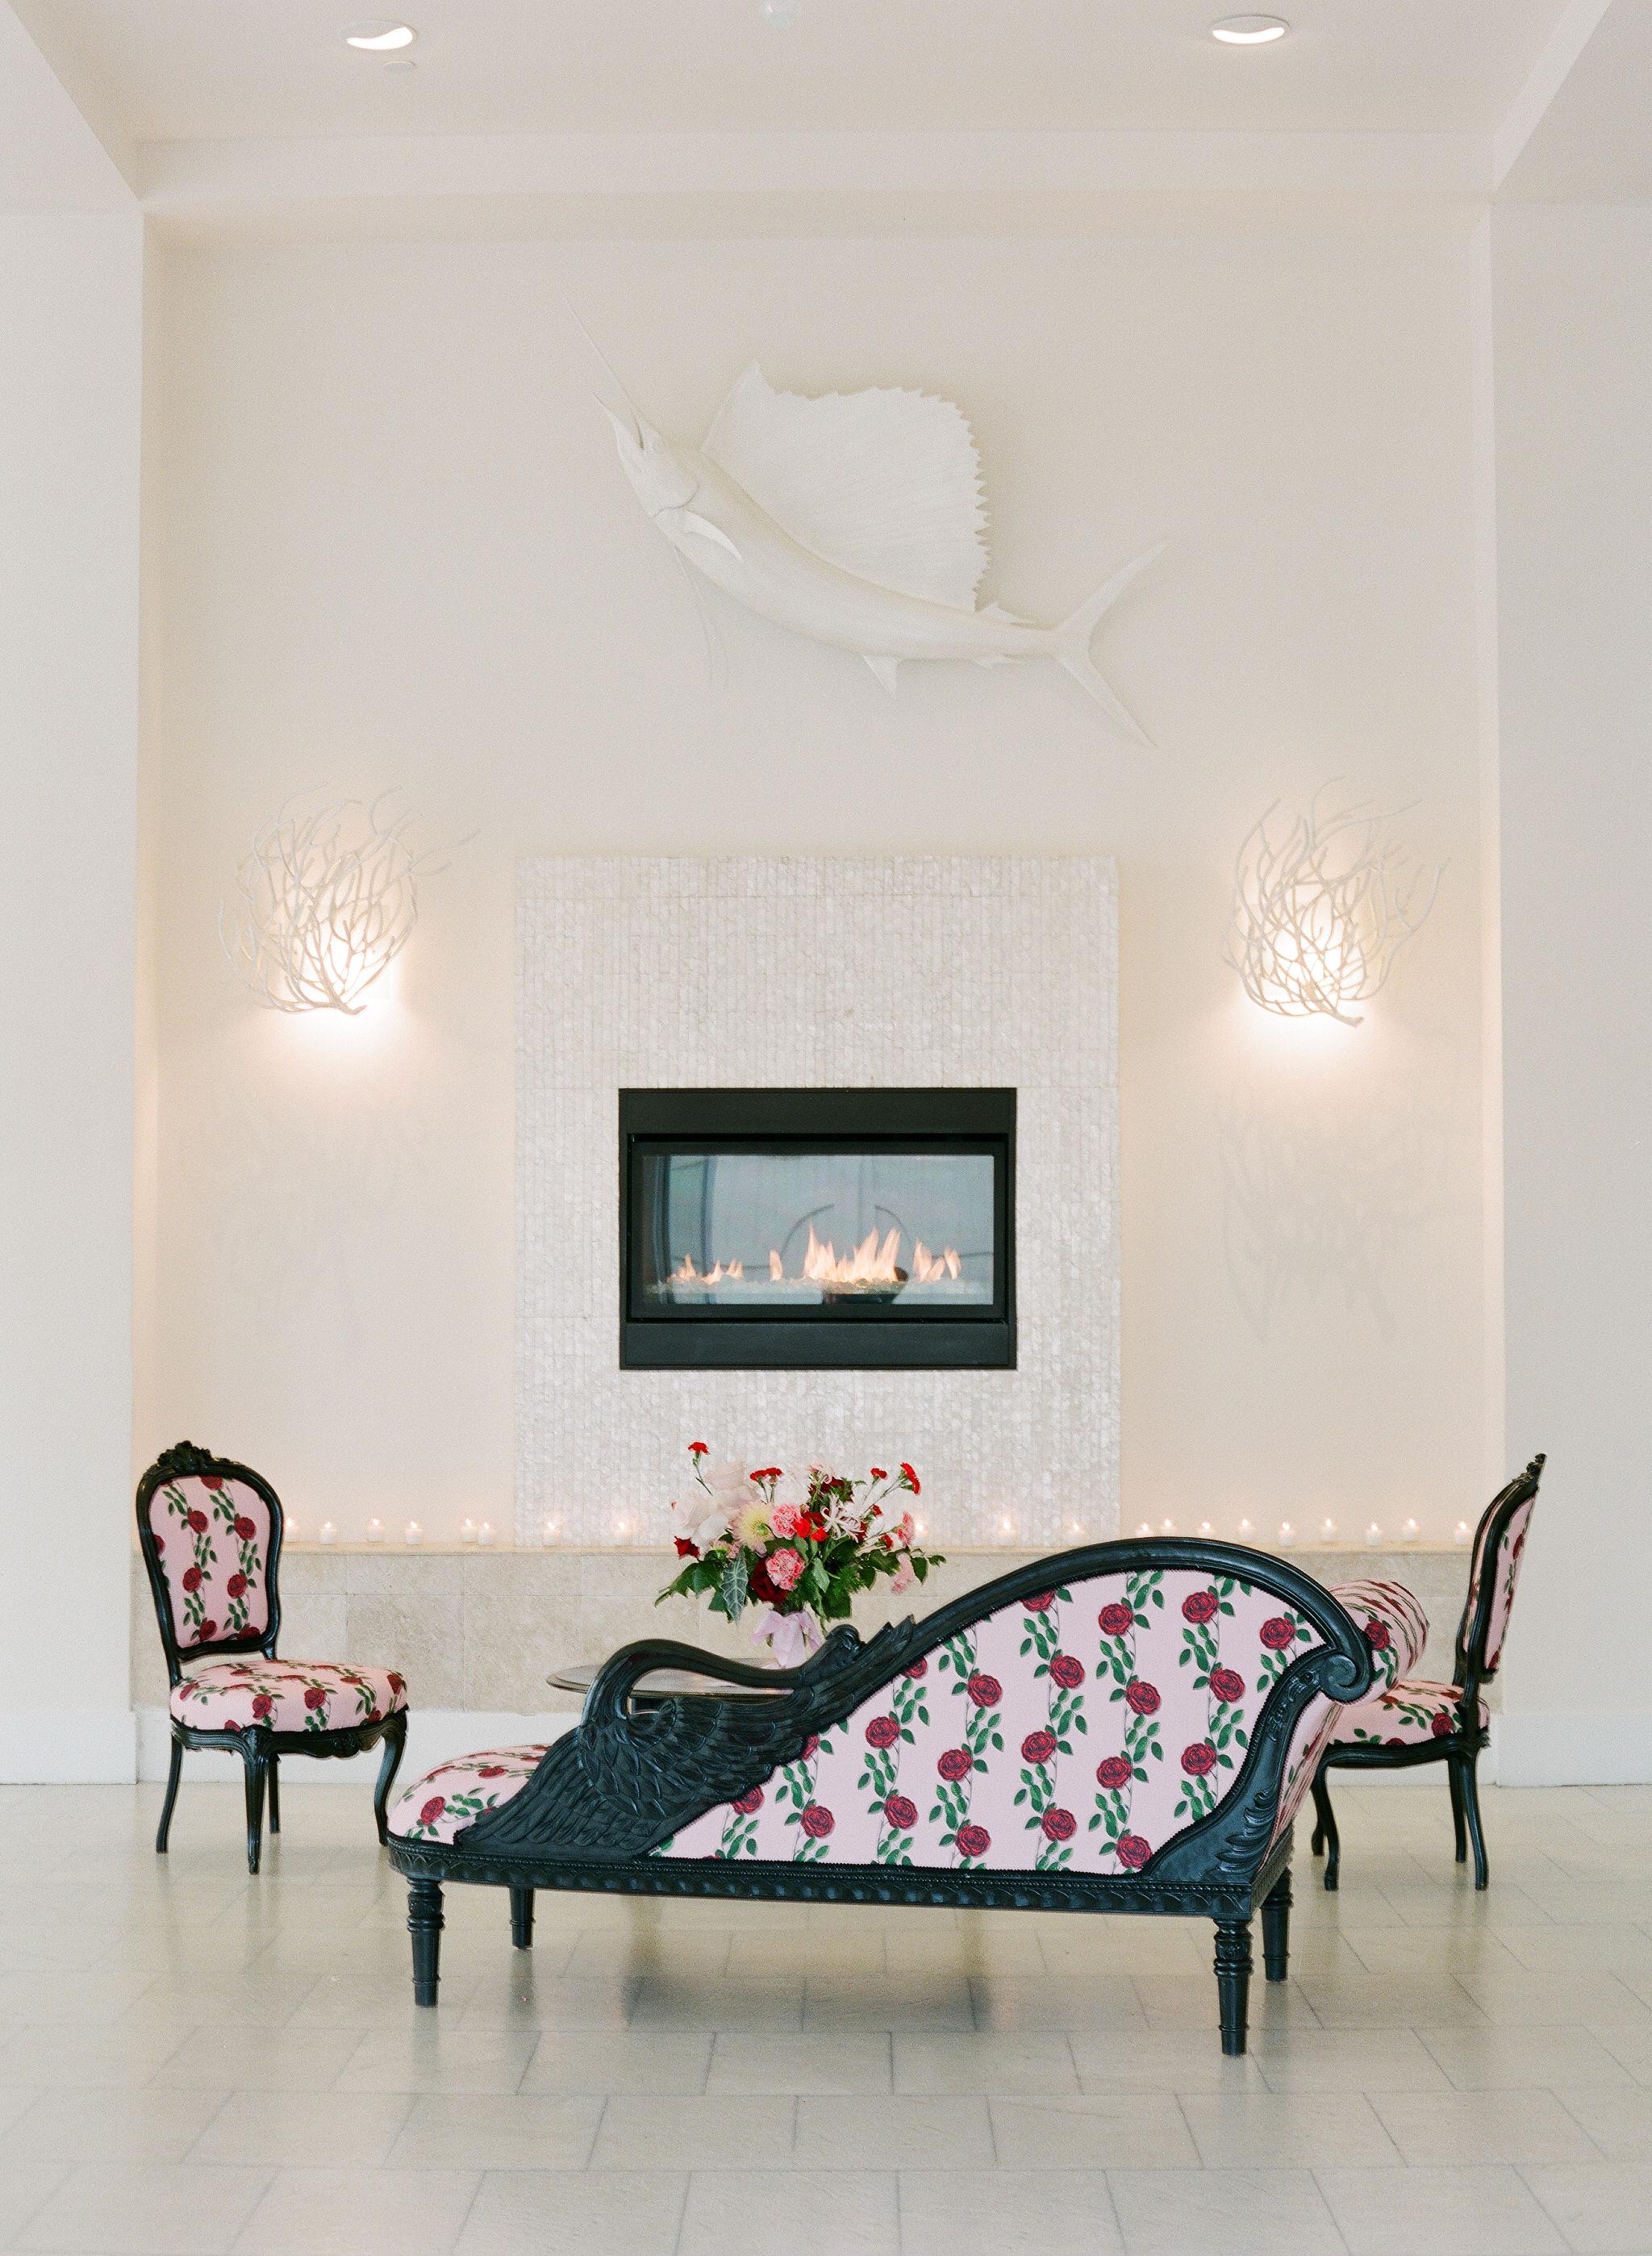 colleen stephen newport wedding floral patterned lounge furniture